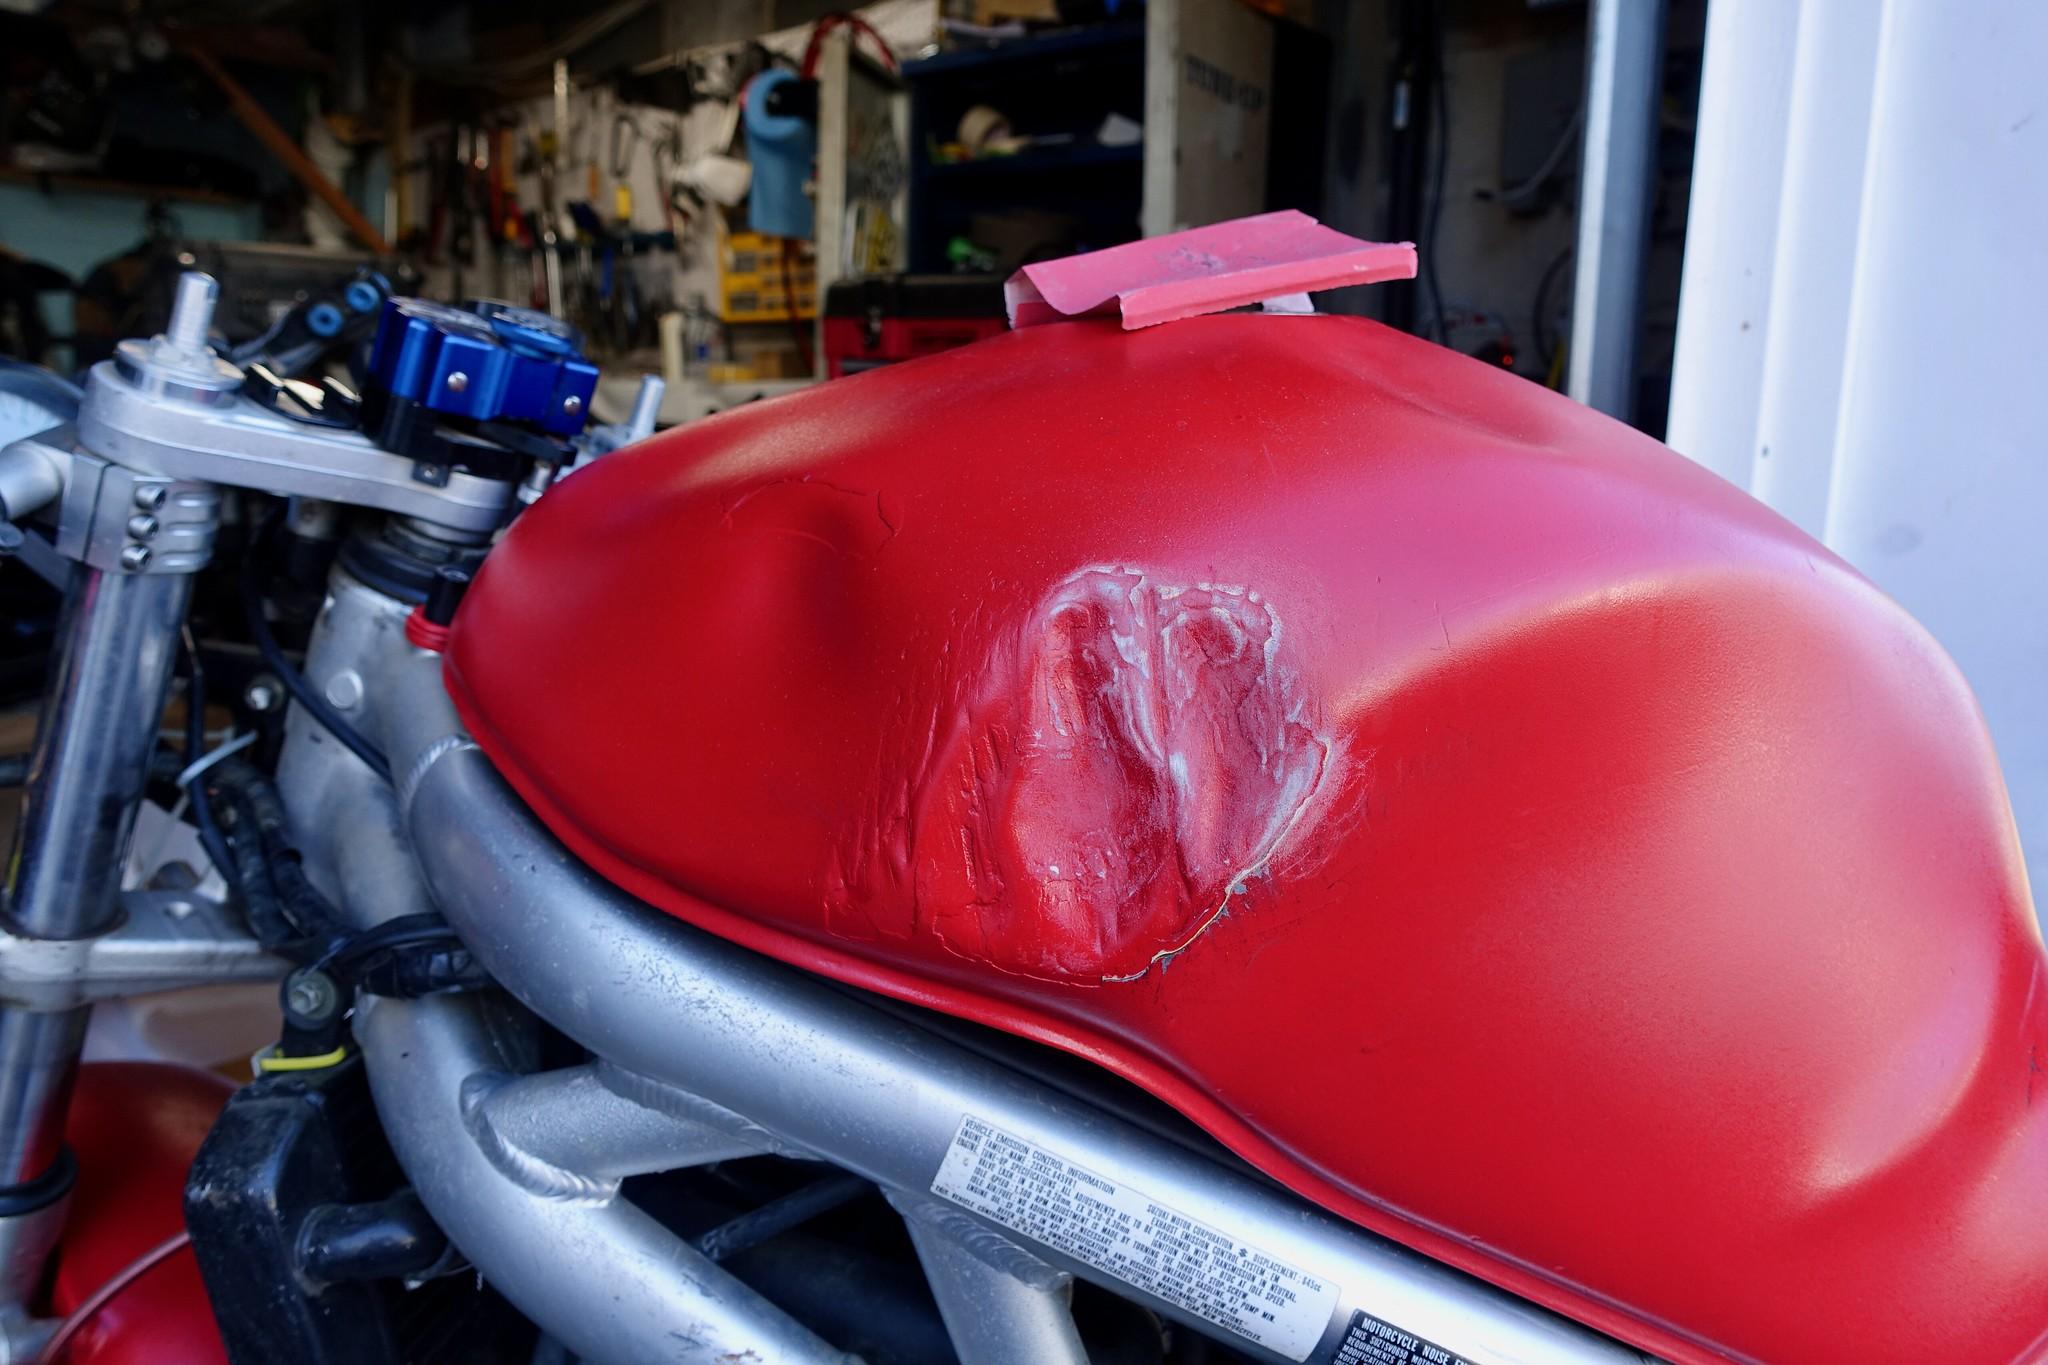 Dented motorcycle tank